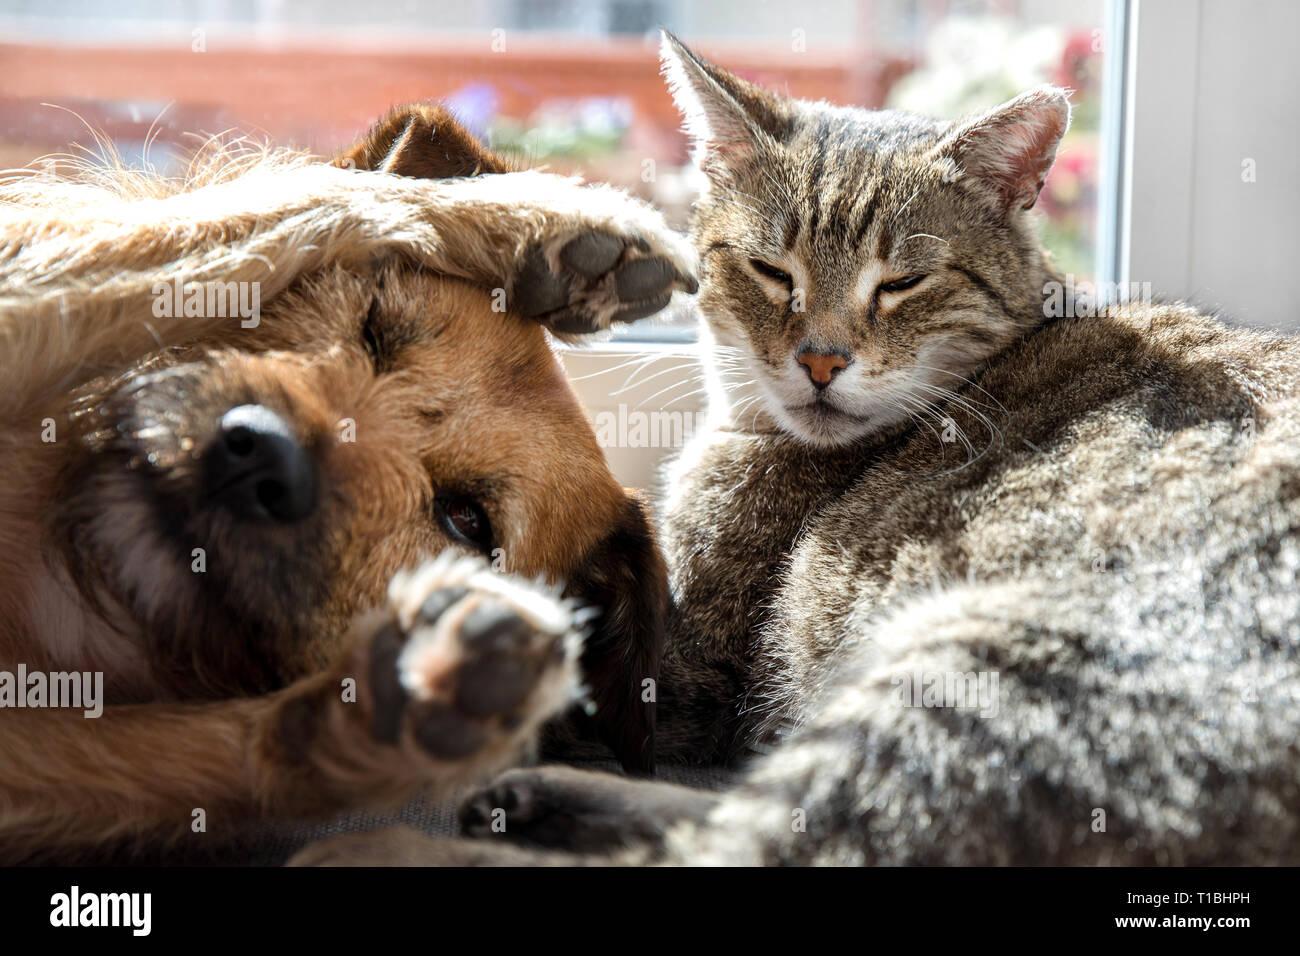 Cat with dog sleeping Stock Photo